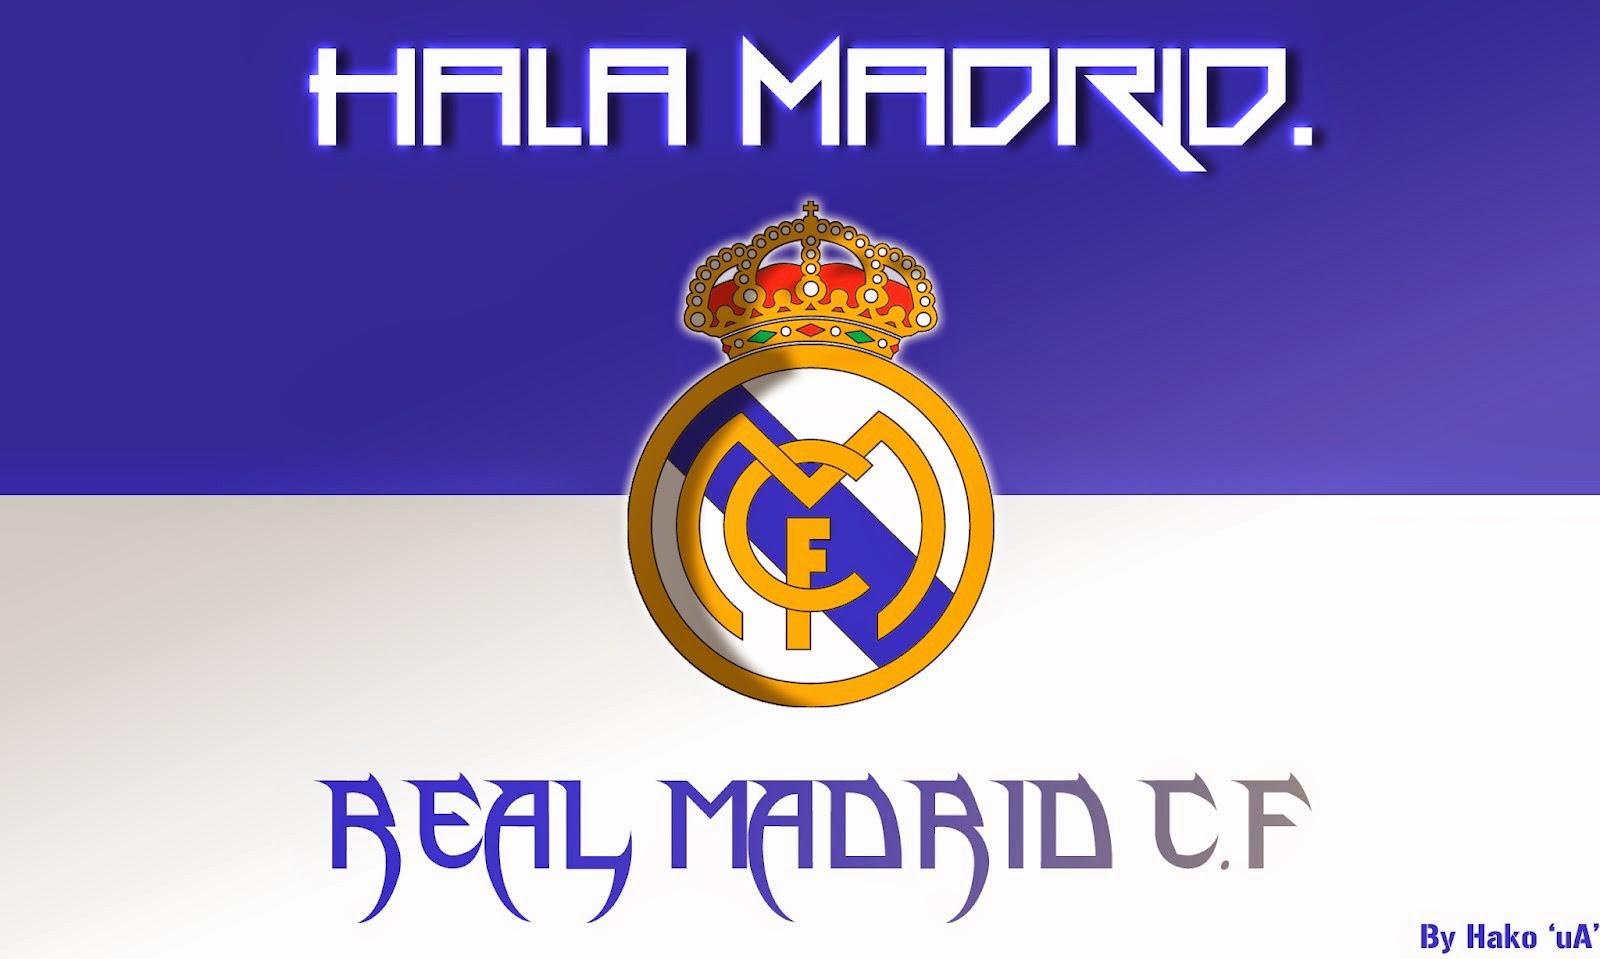 "<img src=""http://4.bp.blogspot.com/-6YTXcA_TzCo/U96VR-zst9I/AAAAAAAAAb0/hl64e2WDVyU/s1600/real-madrid.jpeg"" alt=""Richest Football Clubs in the World"" />"